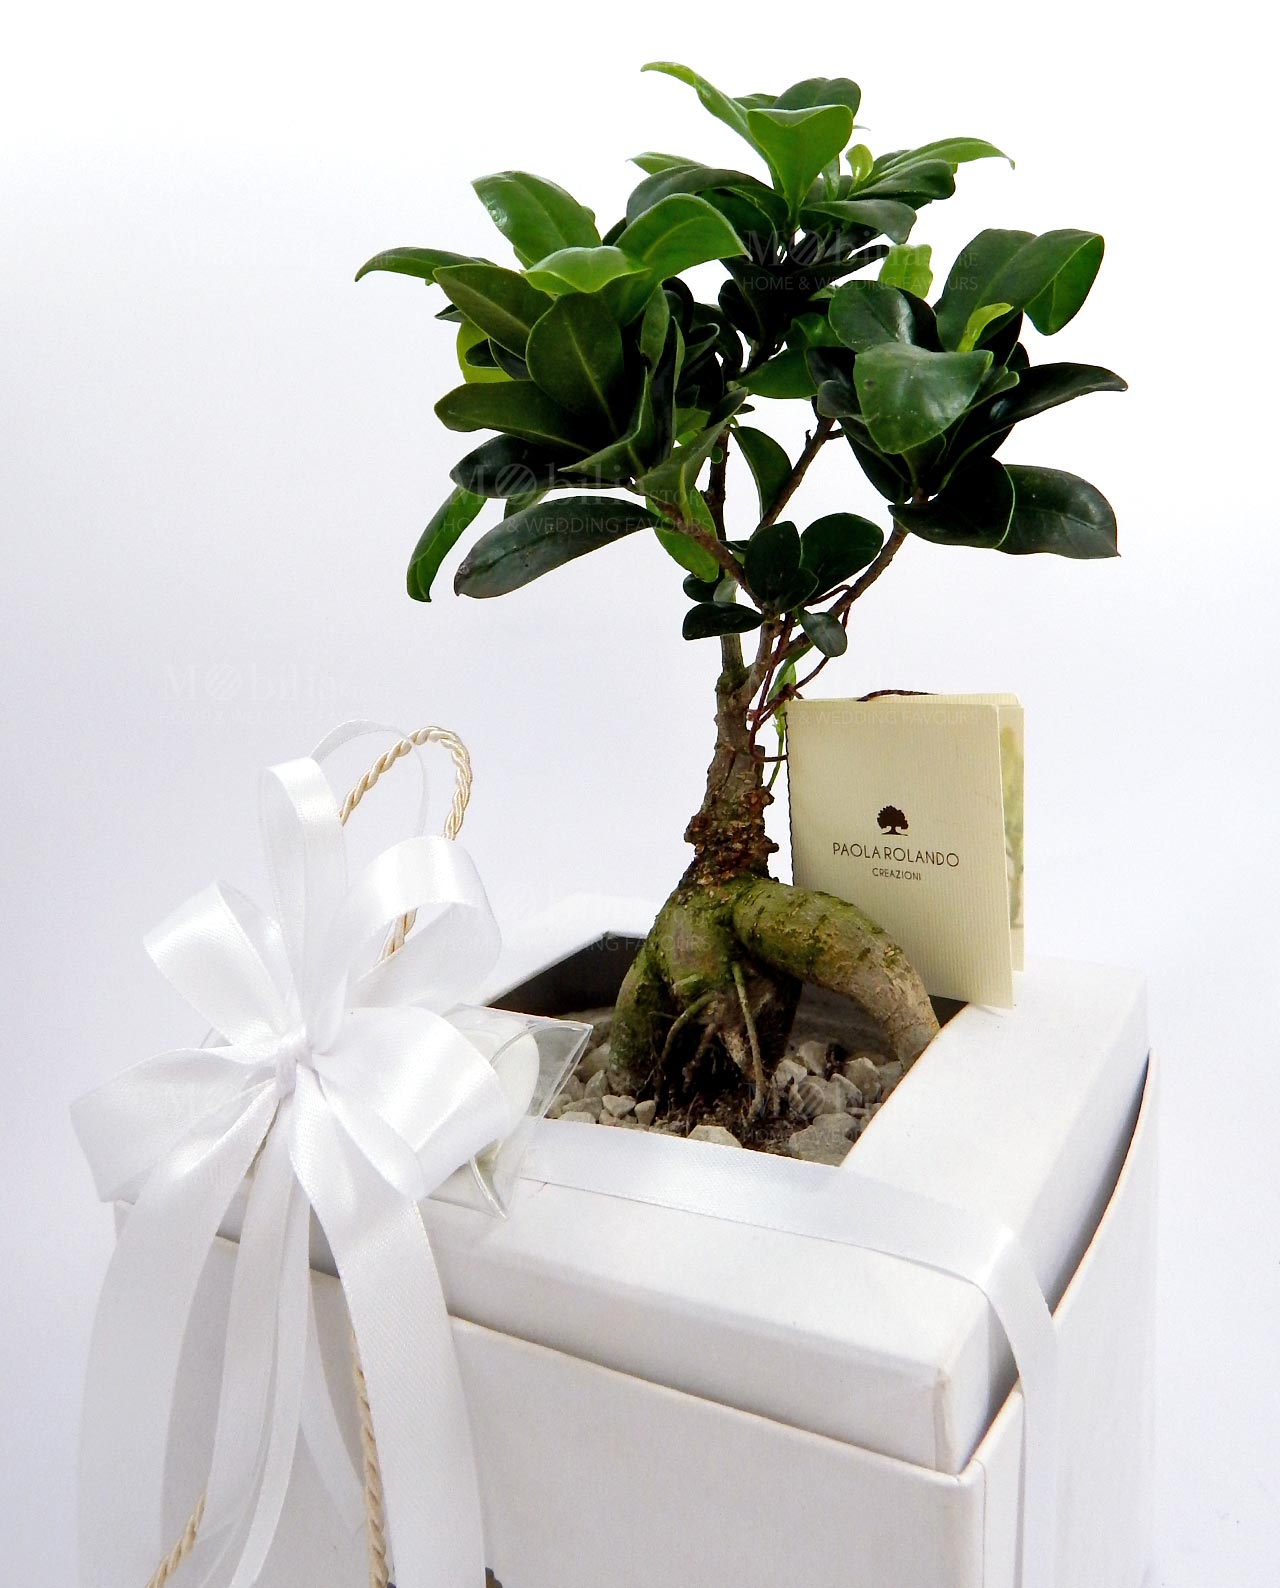 Bomboniera bonsai vivo con vaso in cemento bianco Paola Rolando ...